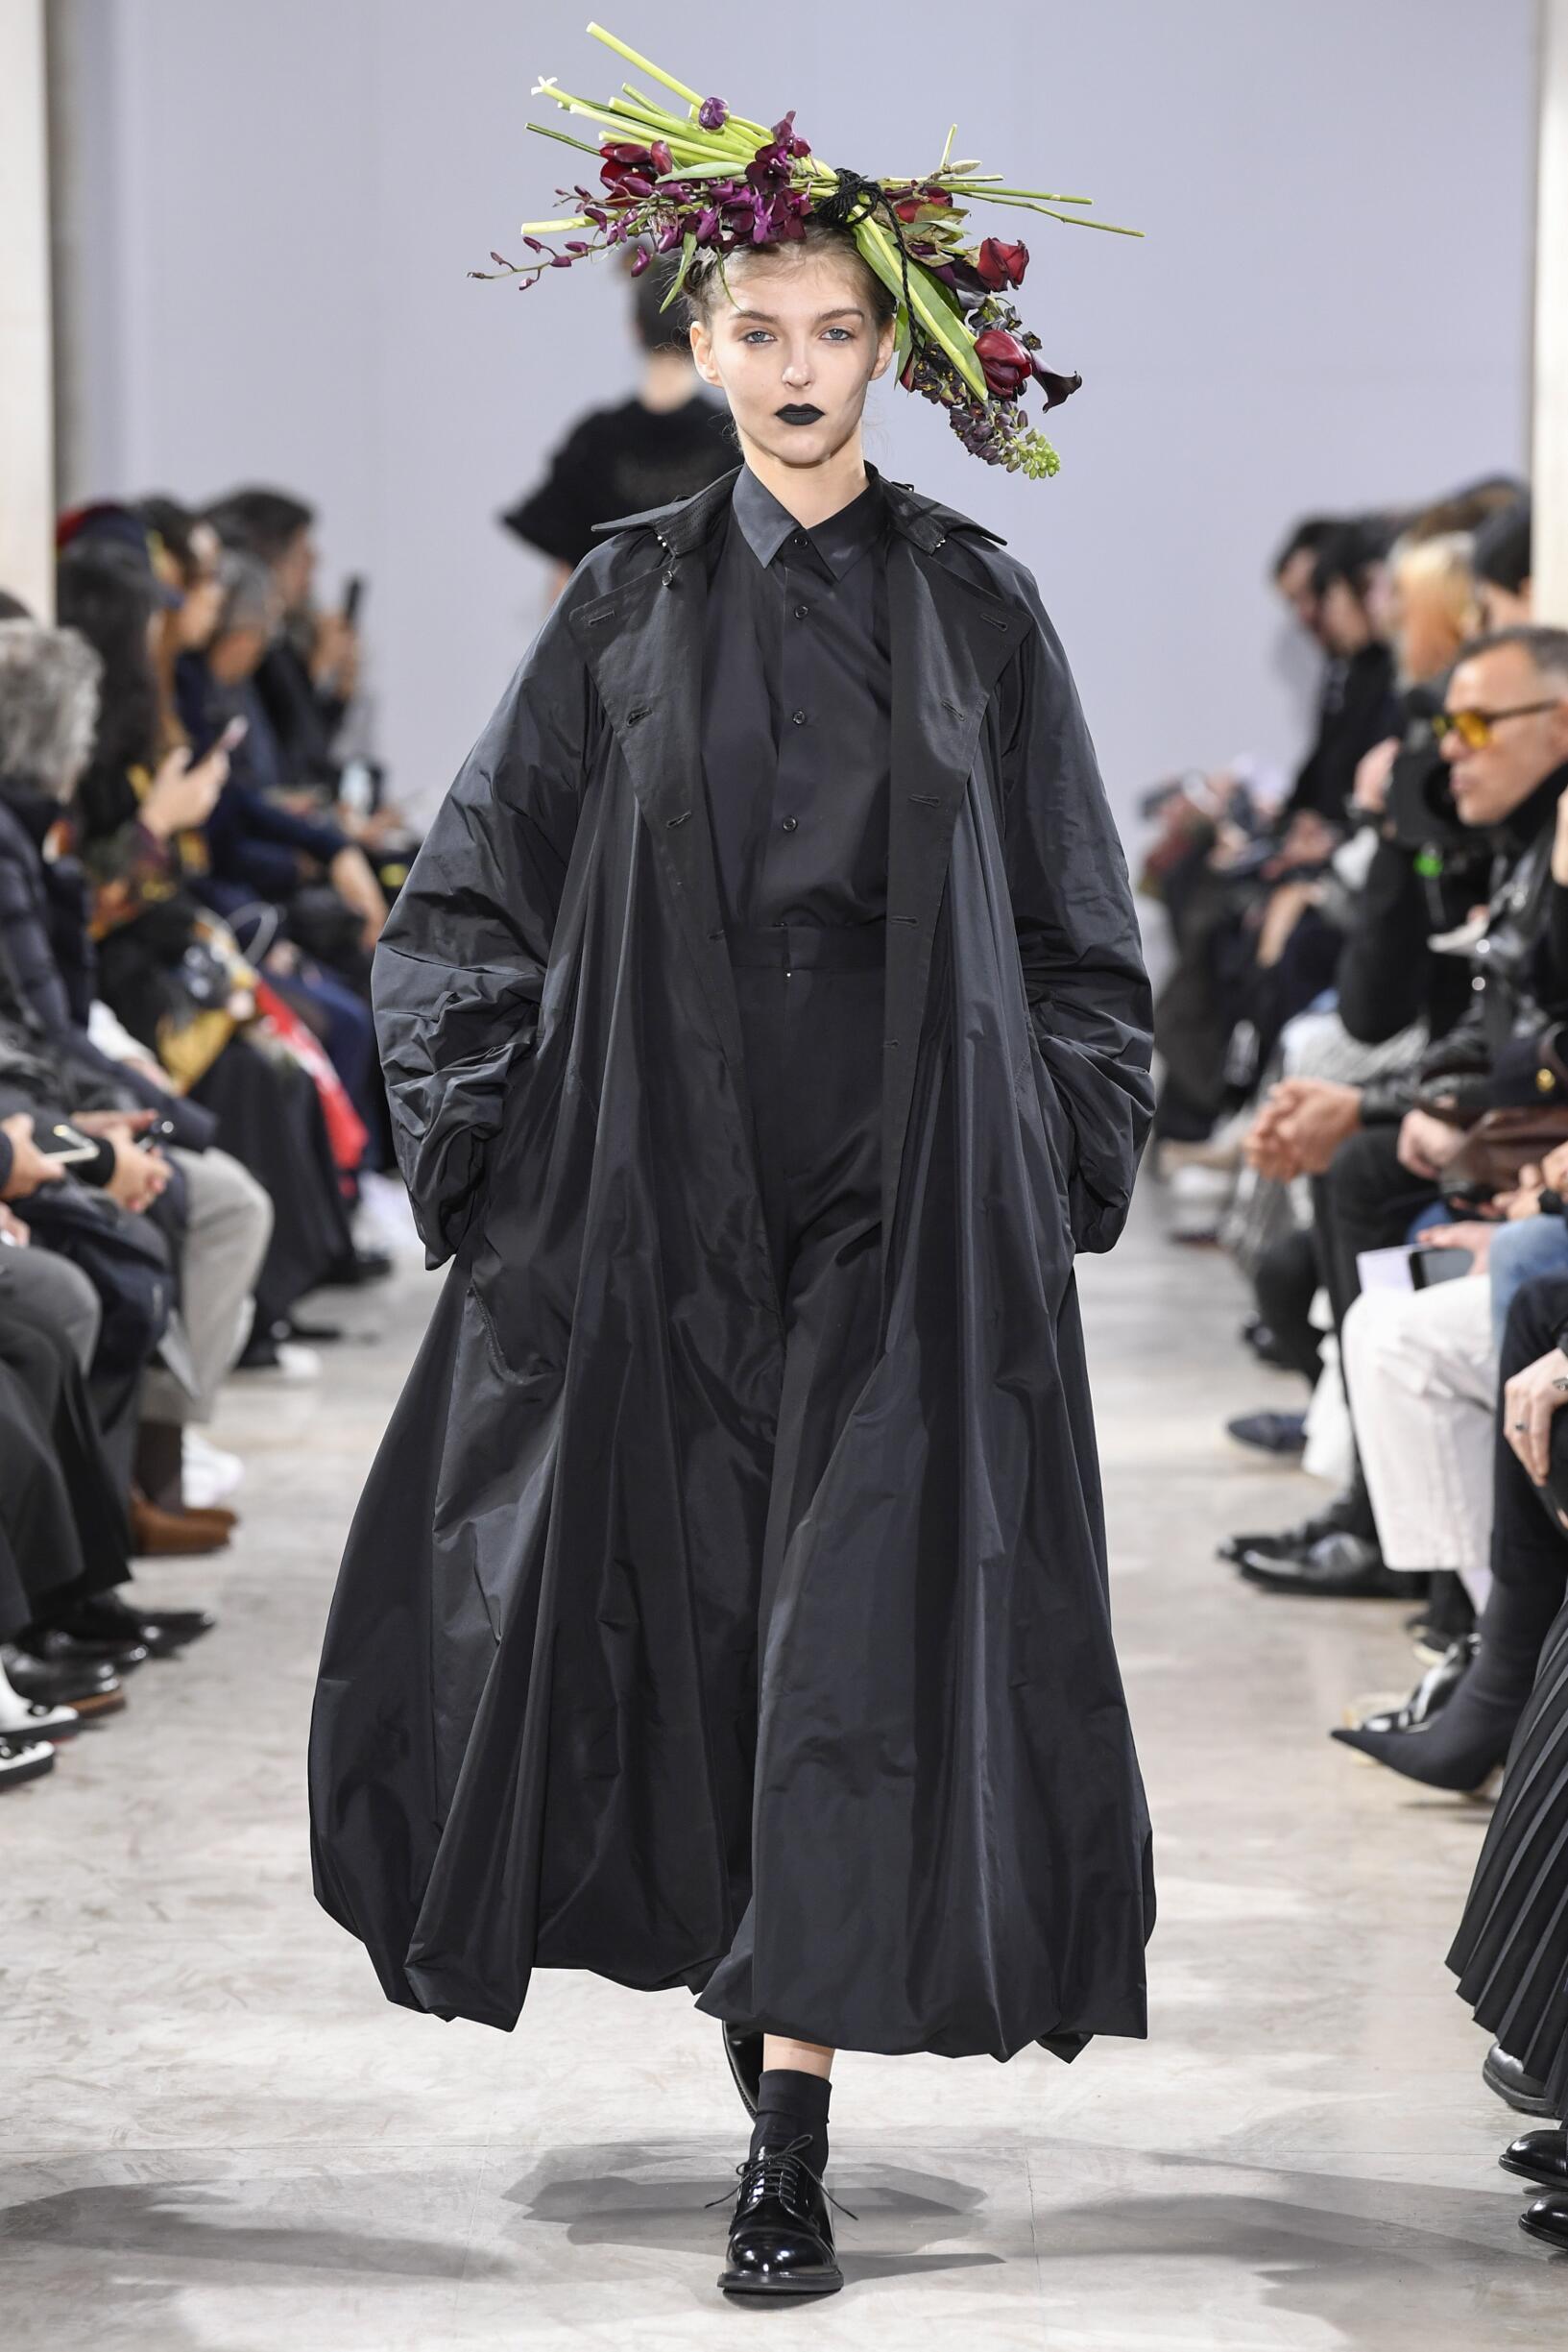 Fashion Woman Model Noir Kei Ninomiya Catwalk